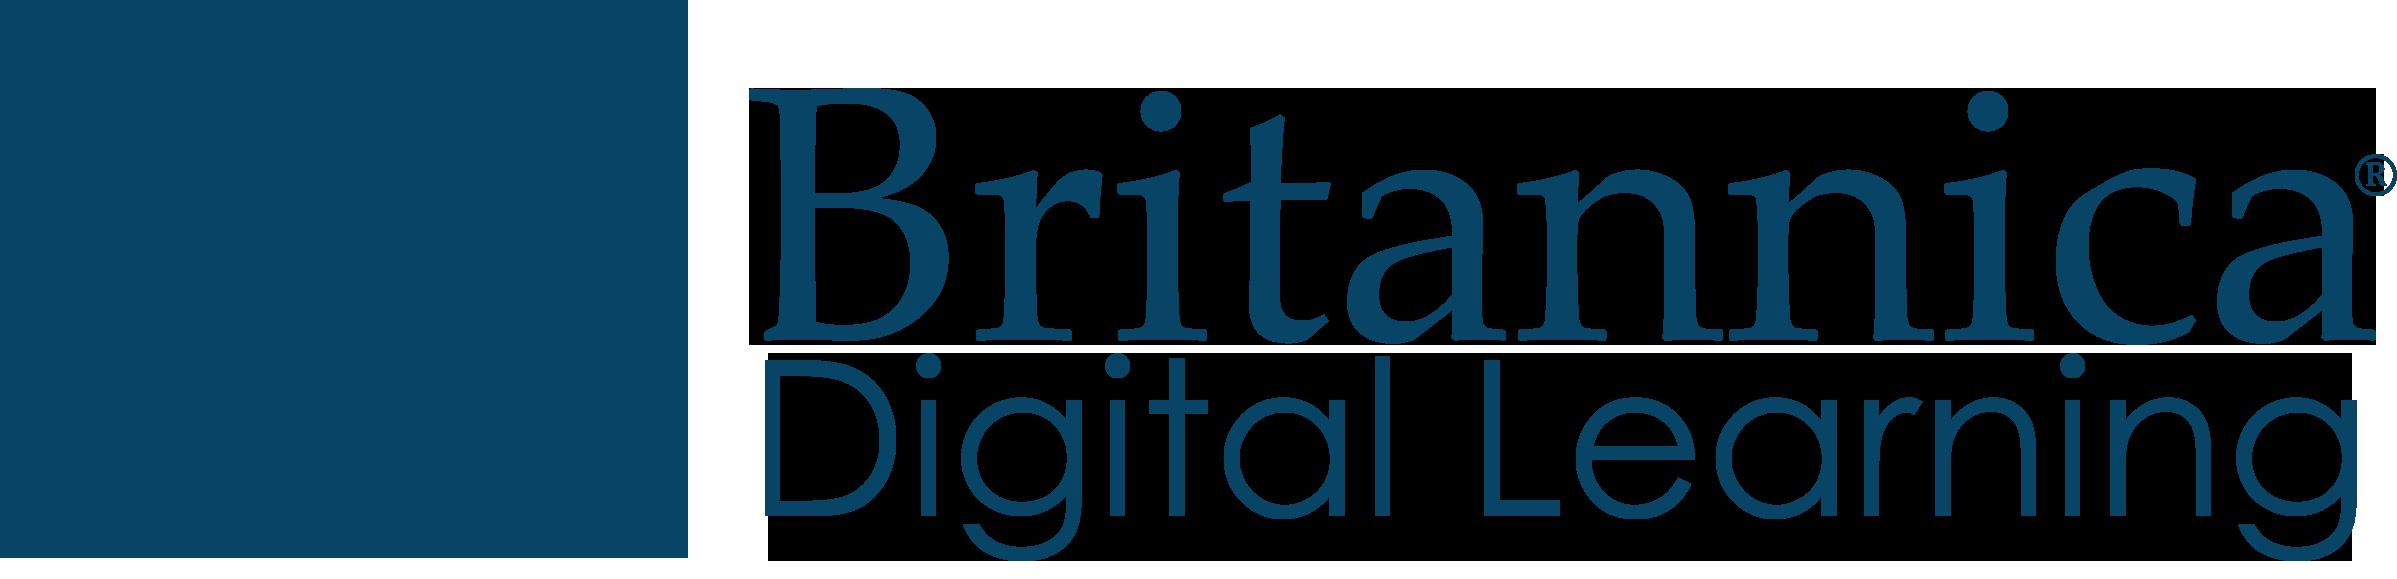 Britannica bdl_logo_nu_blue